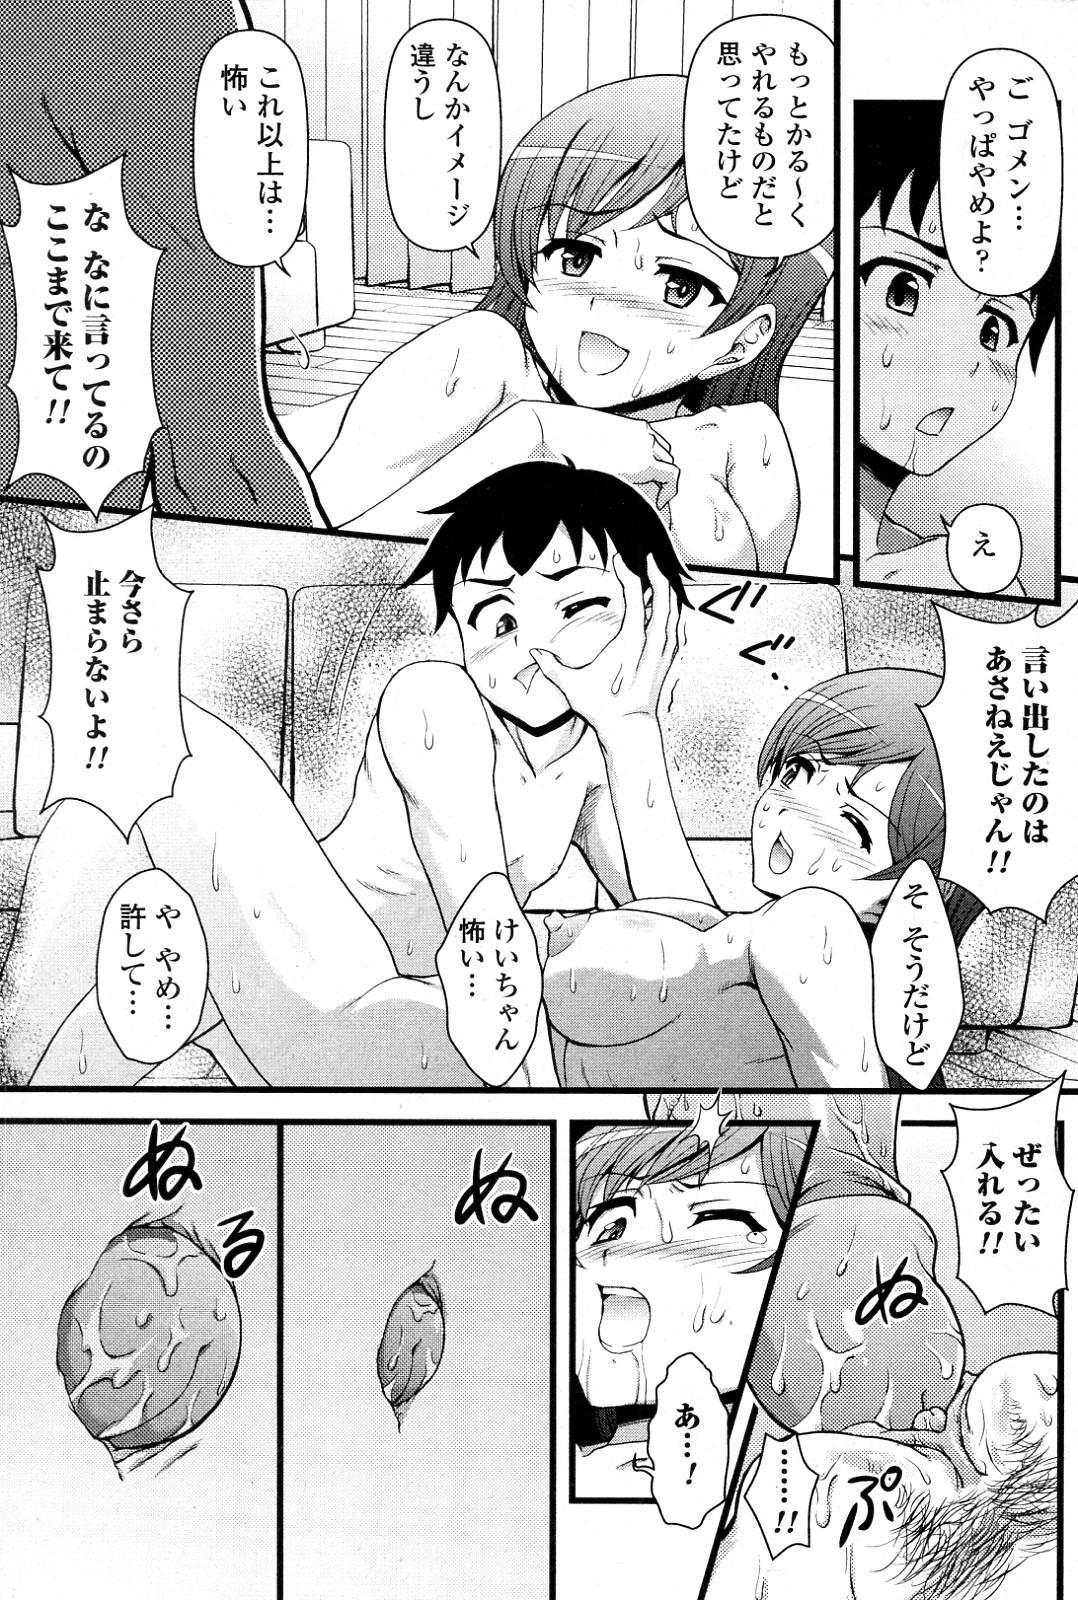 Honki no Love 12